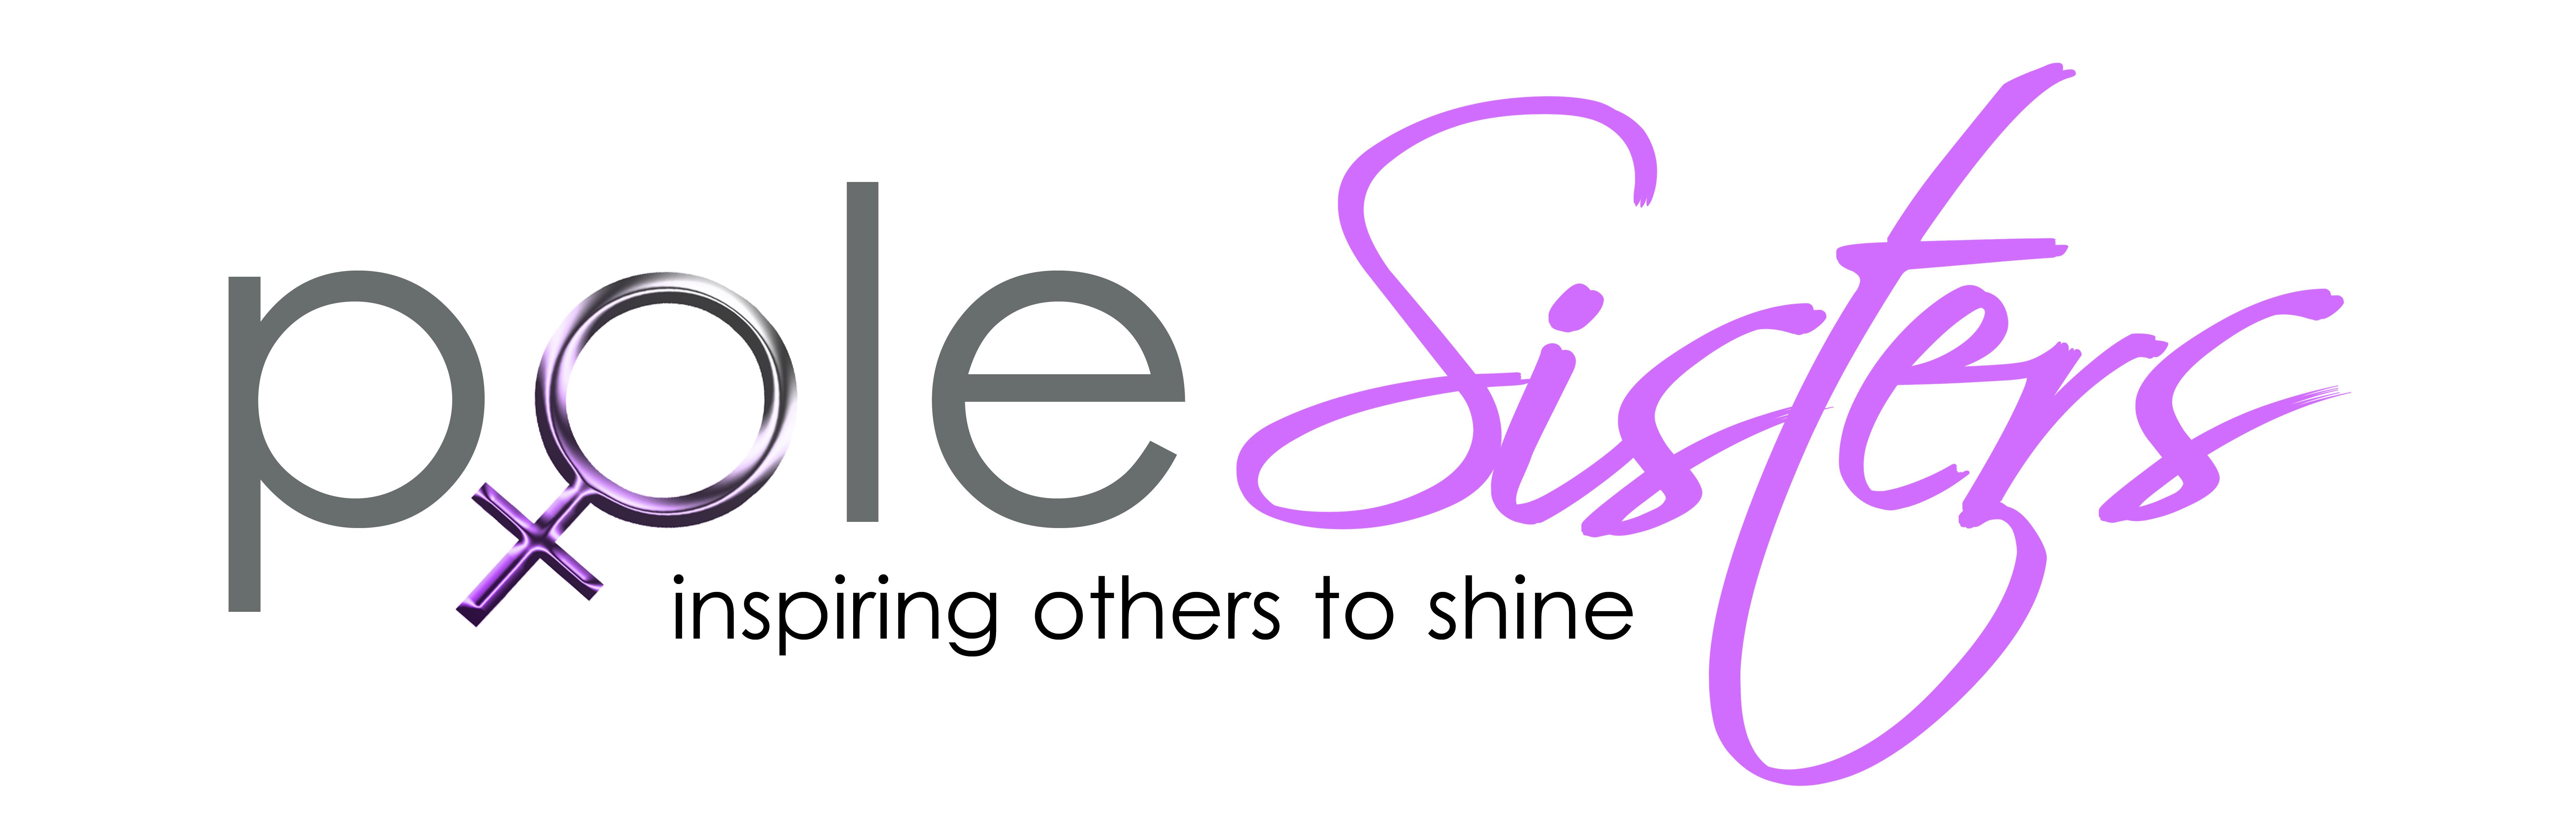 Pole sisters studios